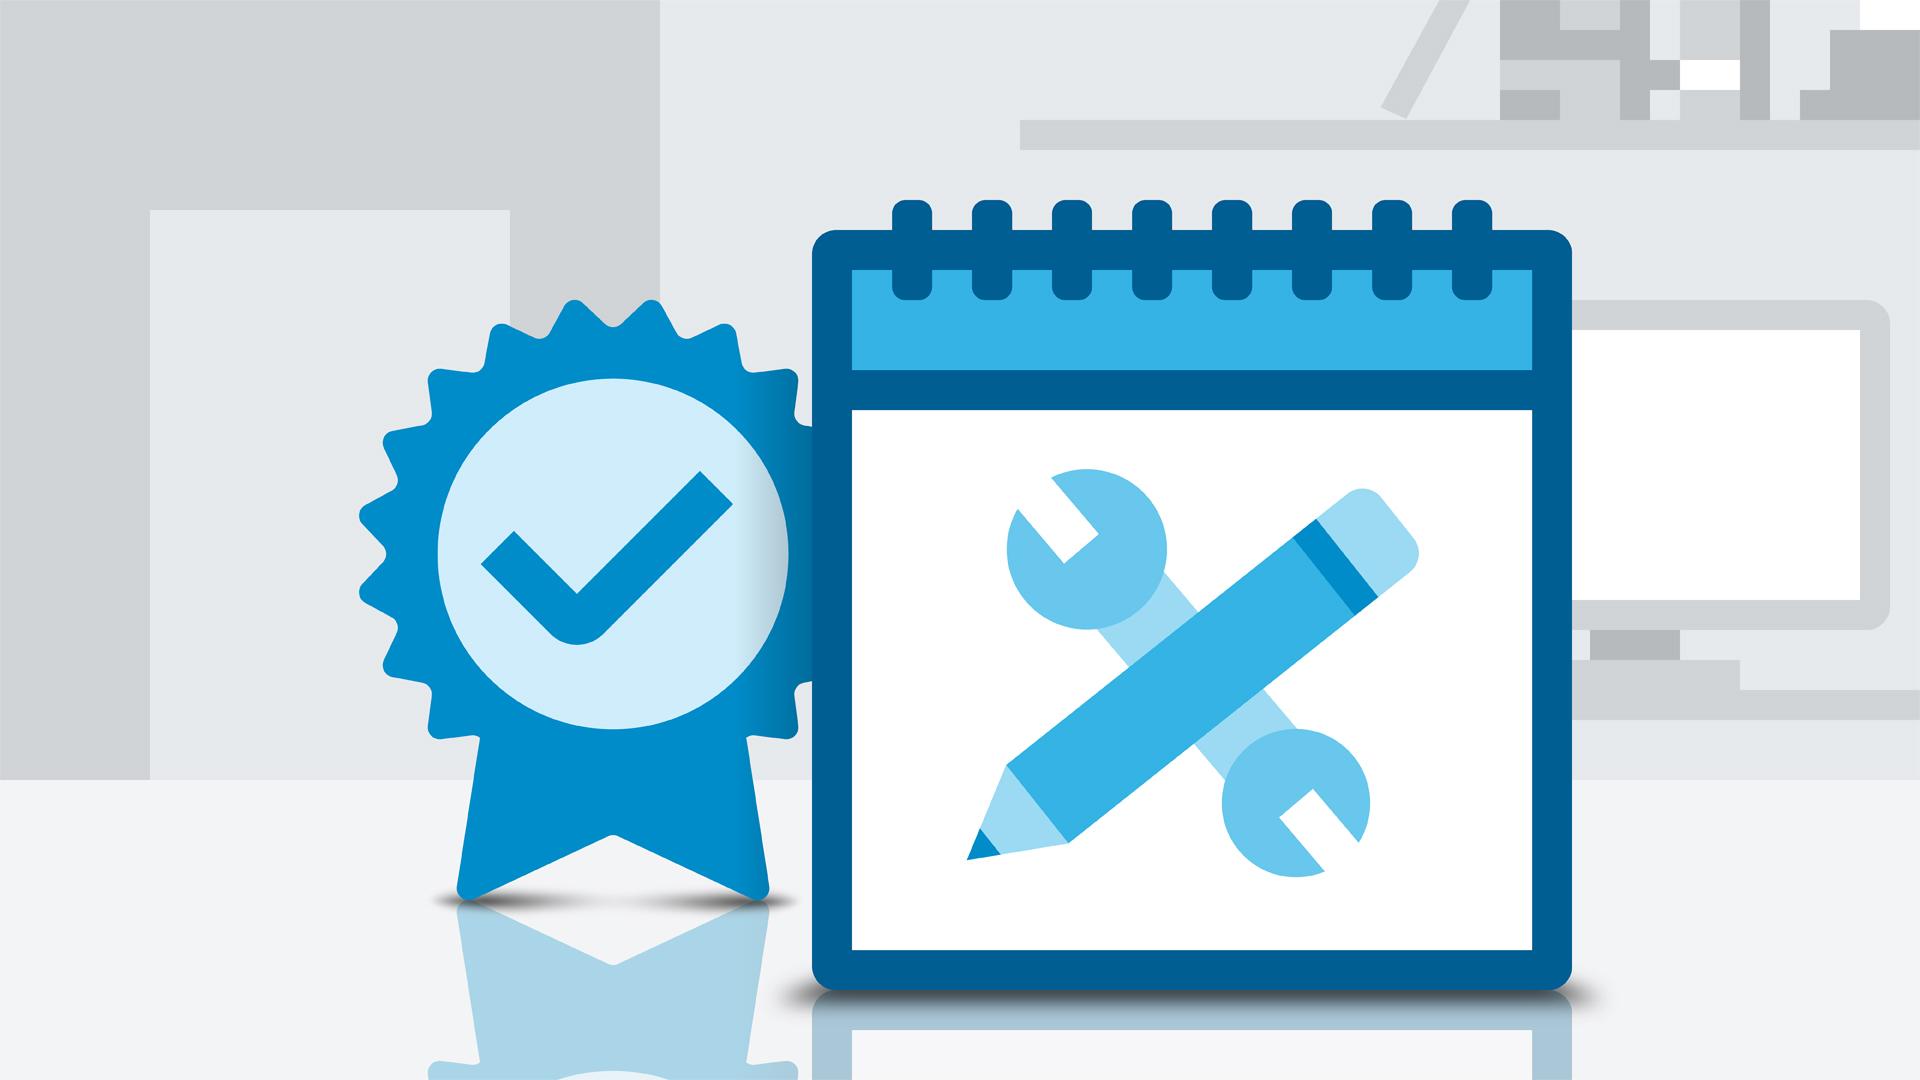 Project management professional pmp certification exam preparation xflitez Image collections